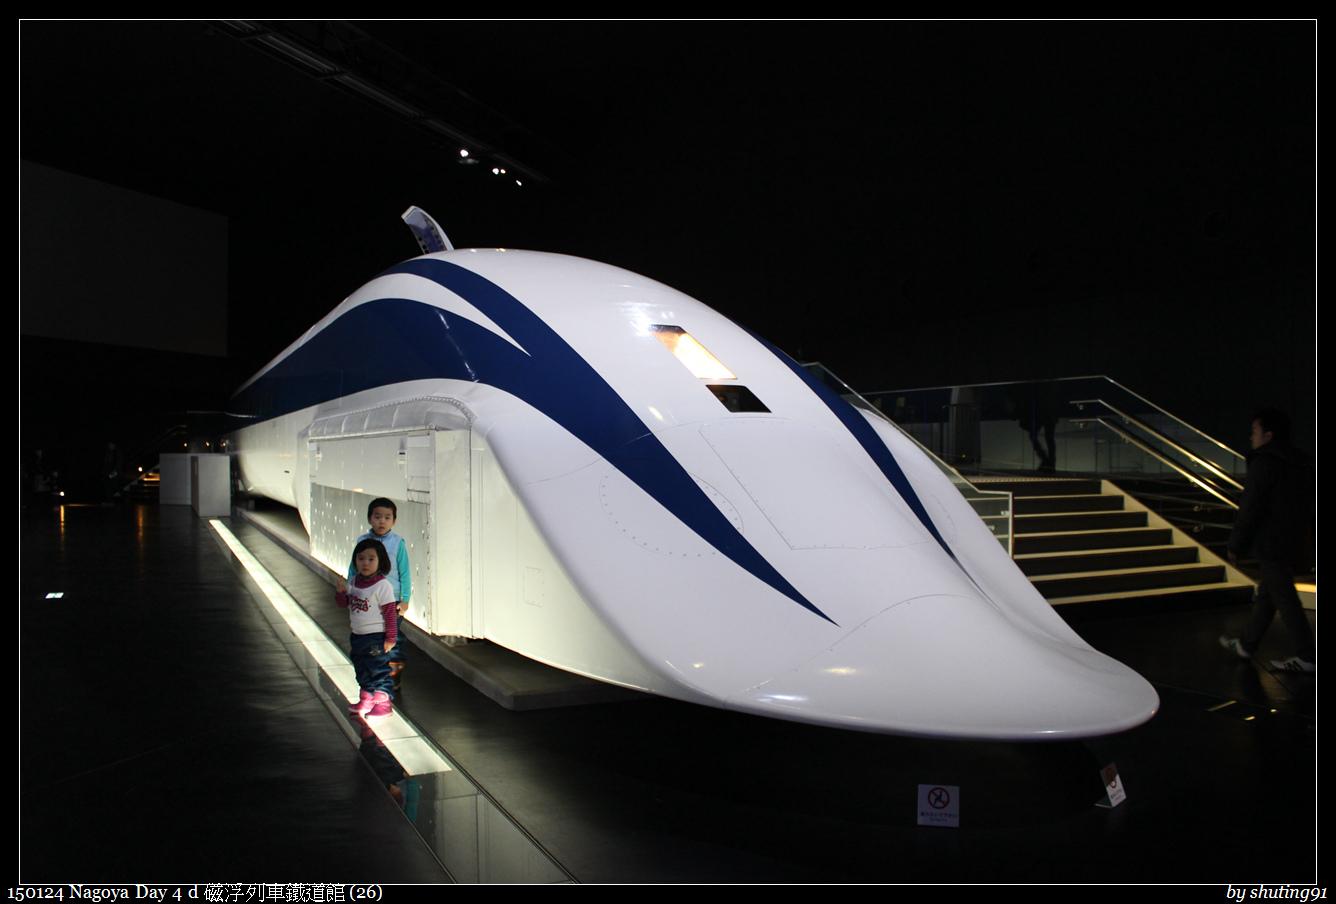 150124 Nagoya Day 4 d 磁浮列車鐵道館 (26).jpg